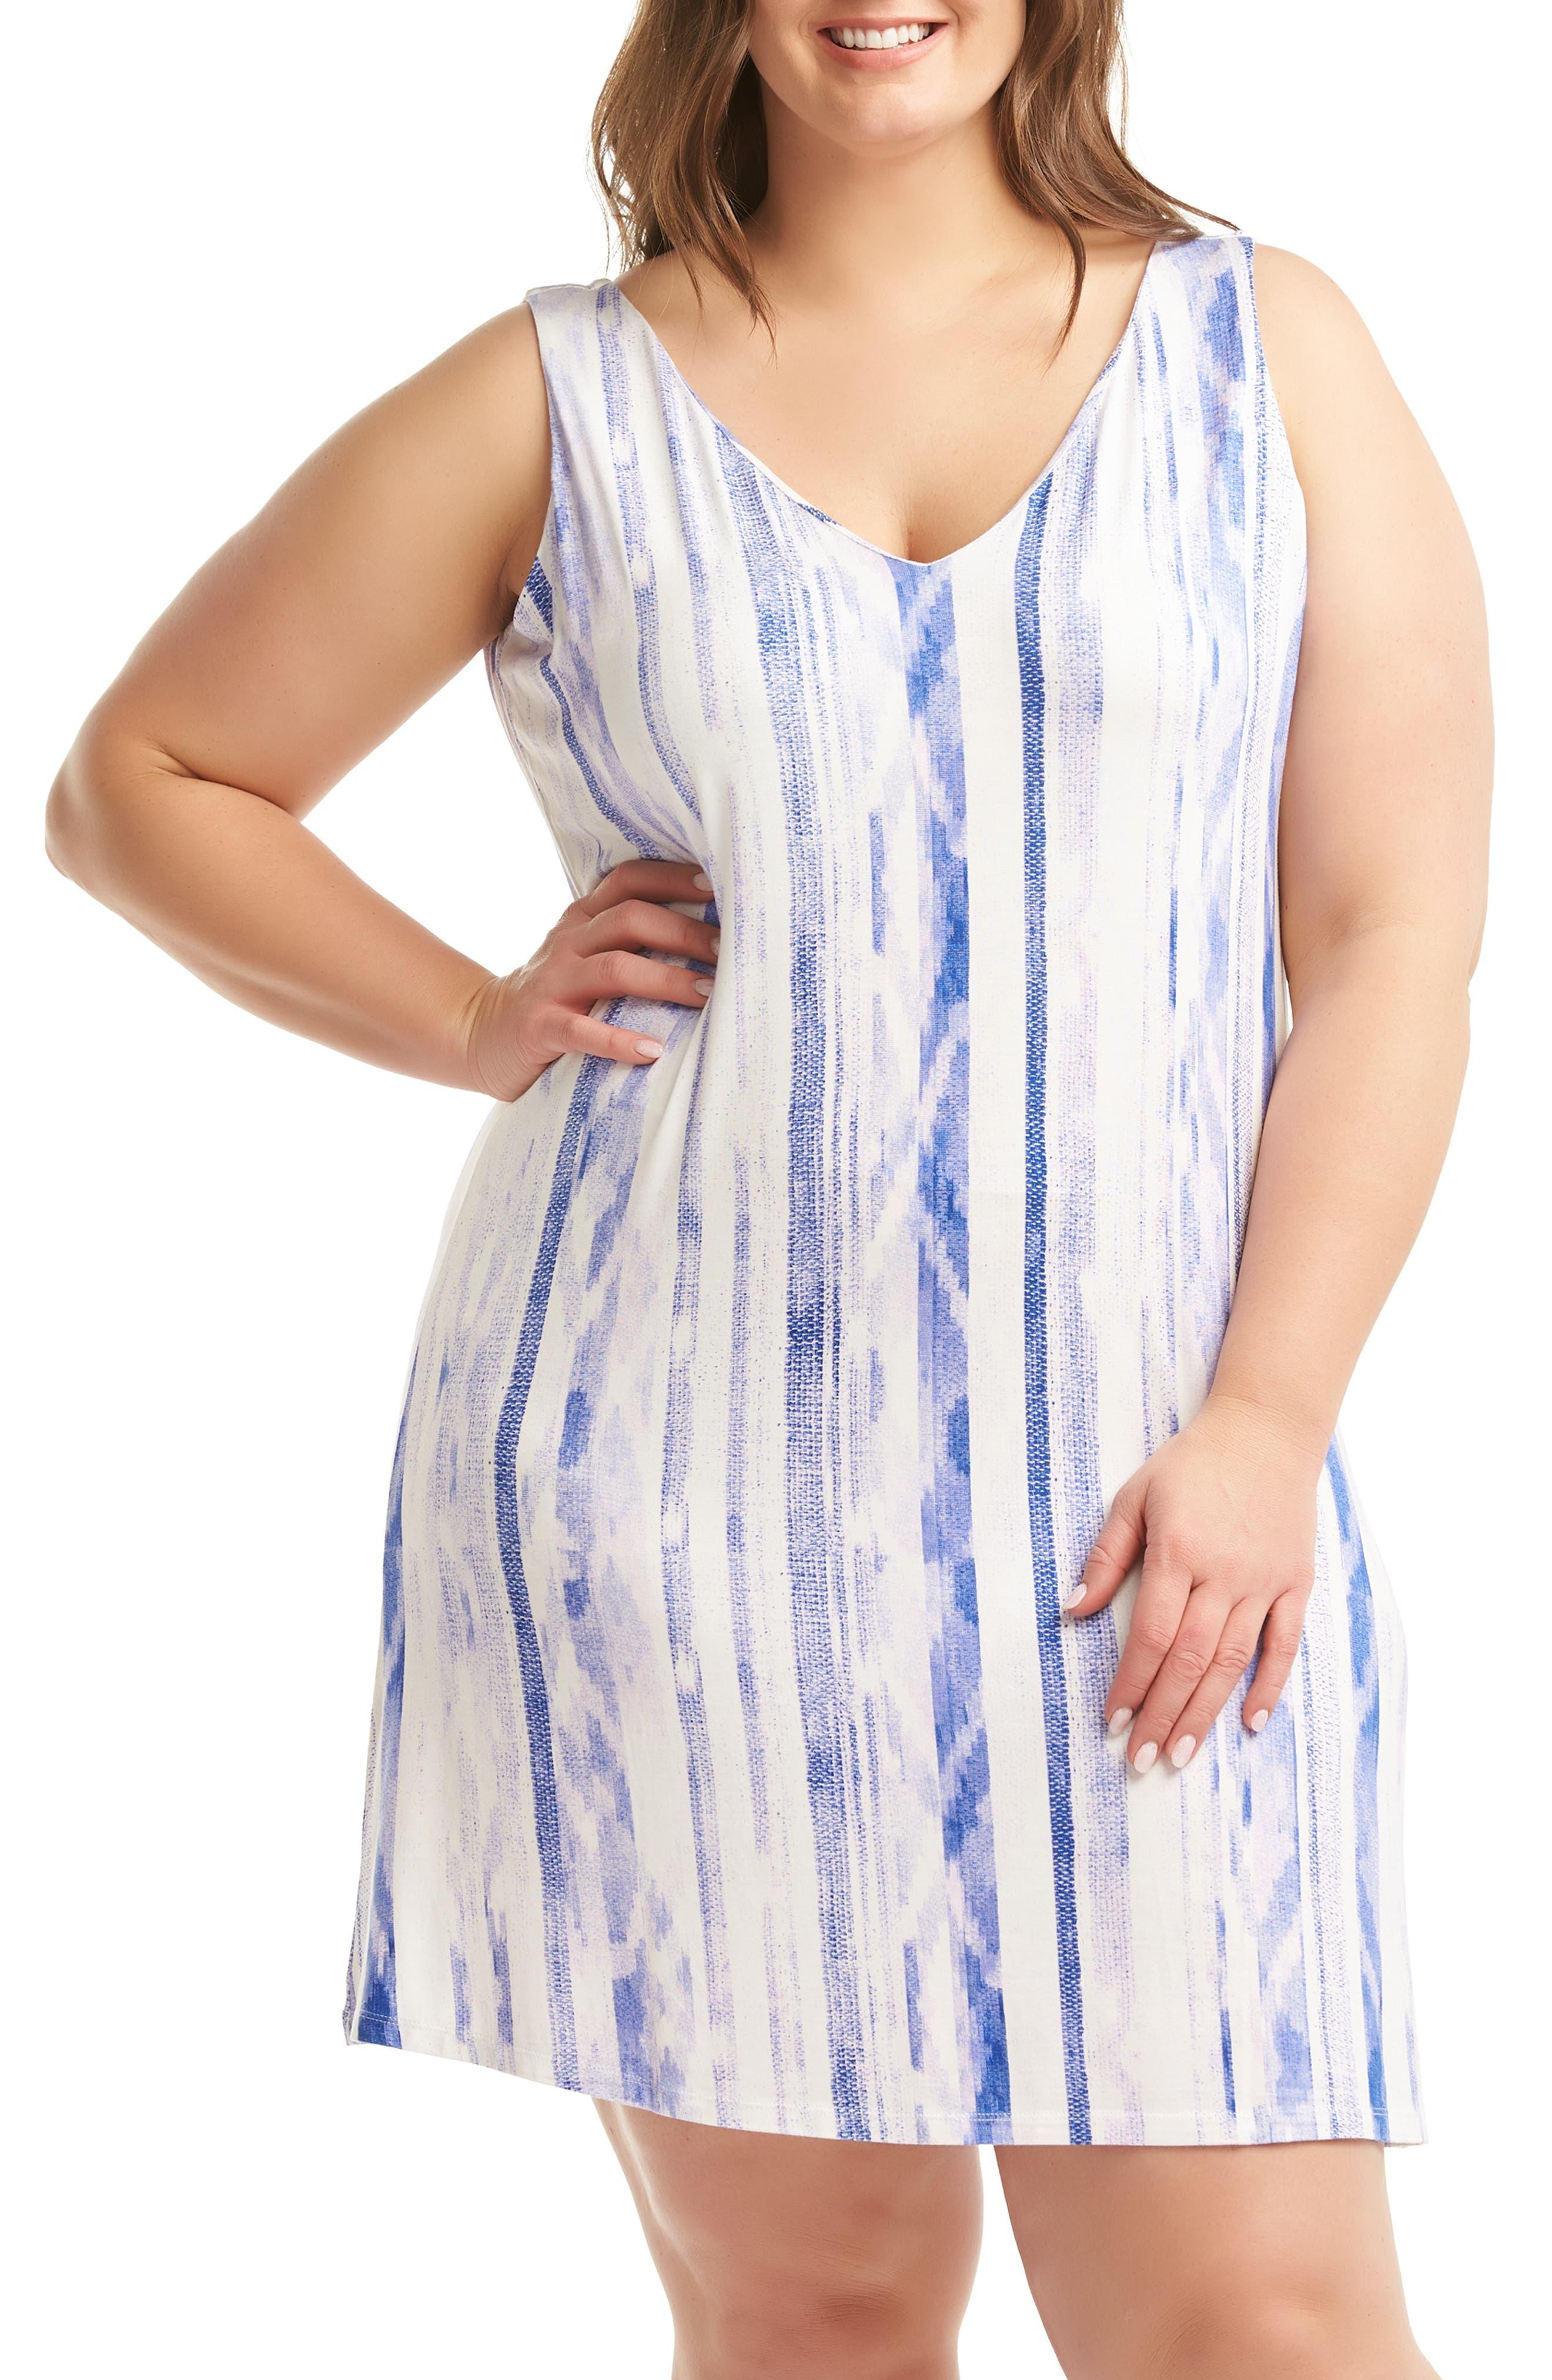 Plus Size Lemon Tart Charlie Dress, White